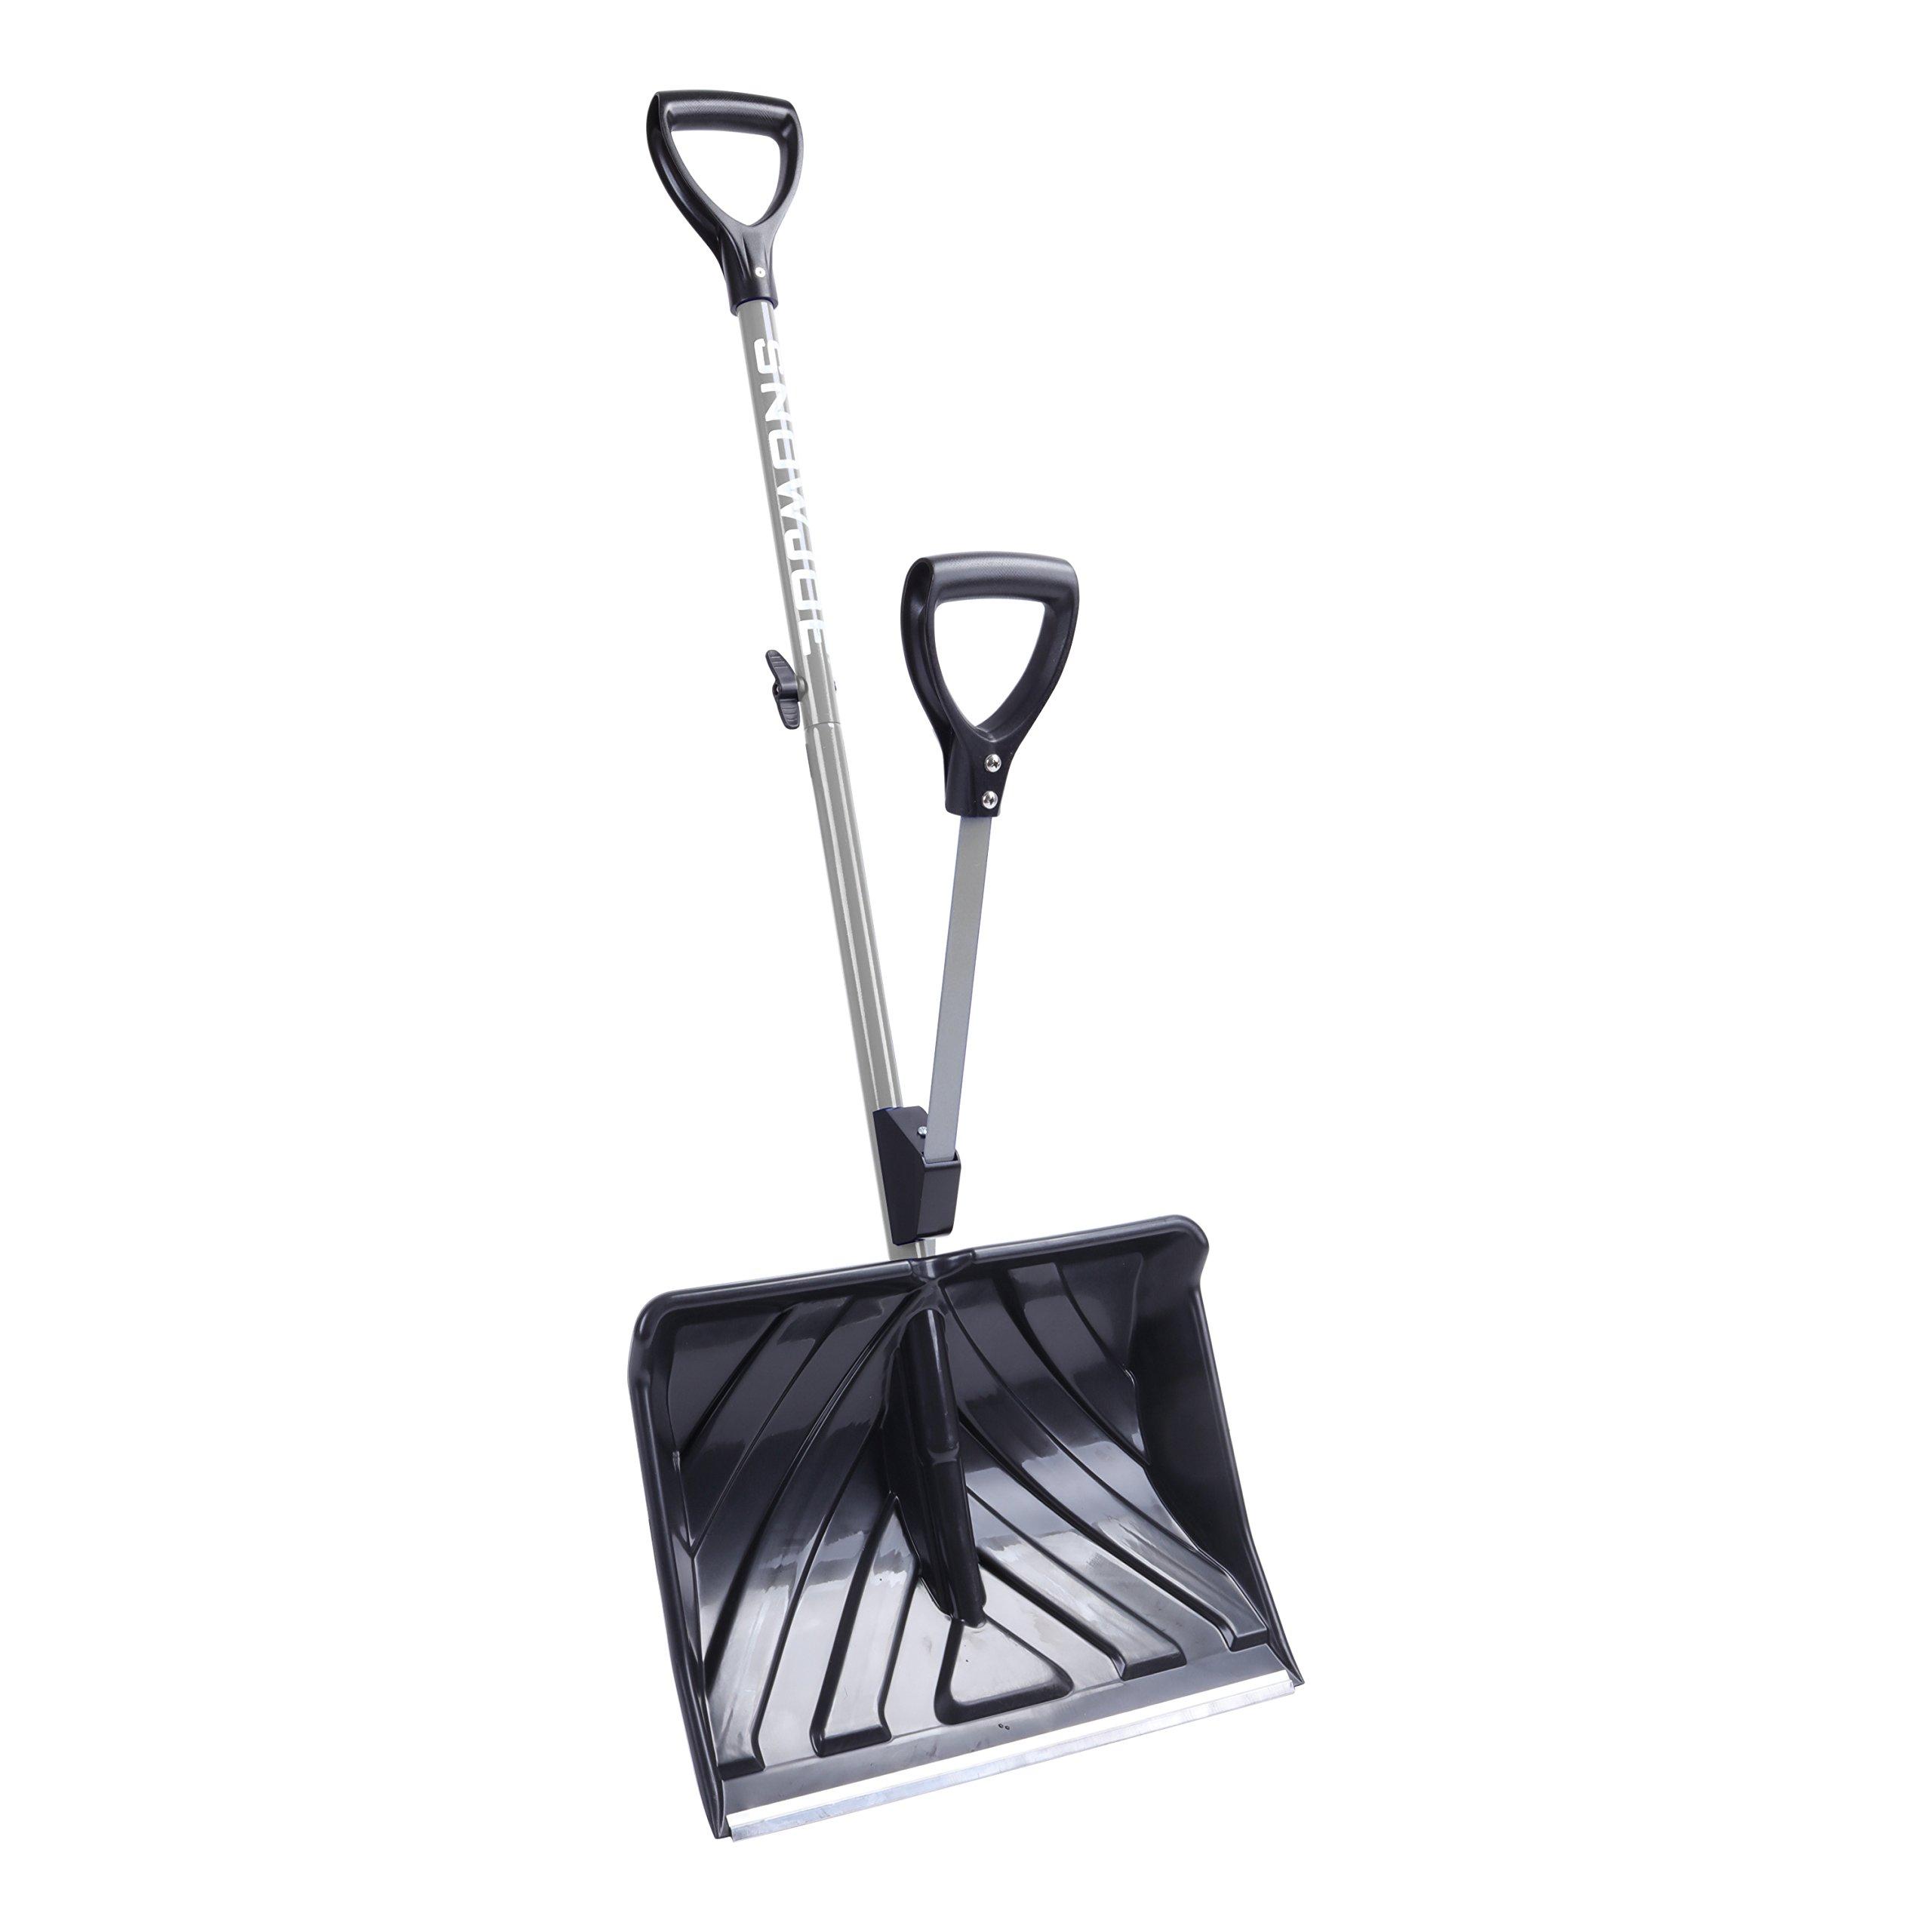 Snow Joe SJ-SHLV01-GRY-RM Shovelution Strain-Reducing Snow Shovel (Gray) (Certified Refurbished) | 18-Inch | Spring Assisted Handle